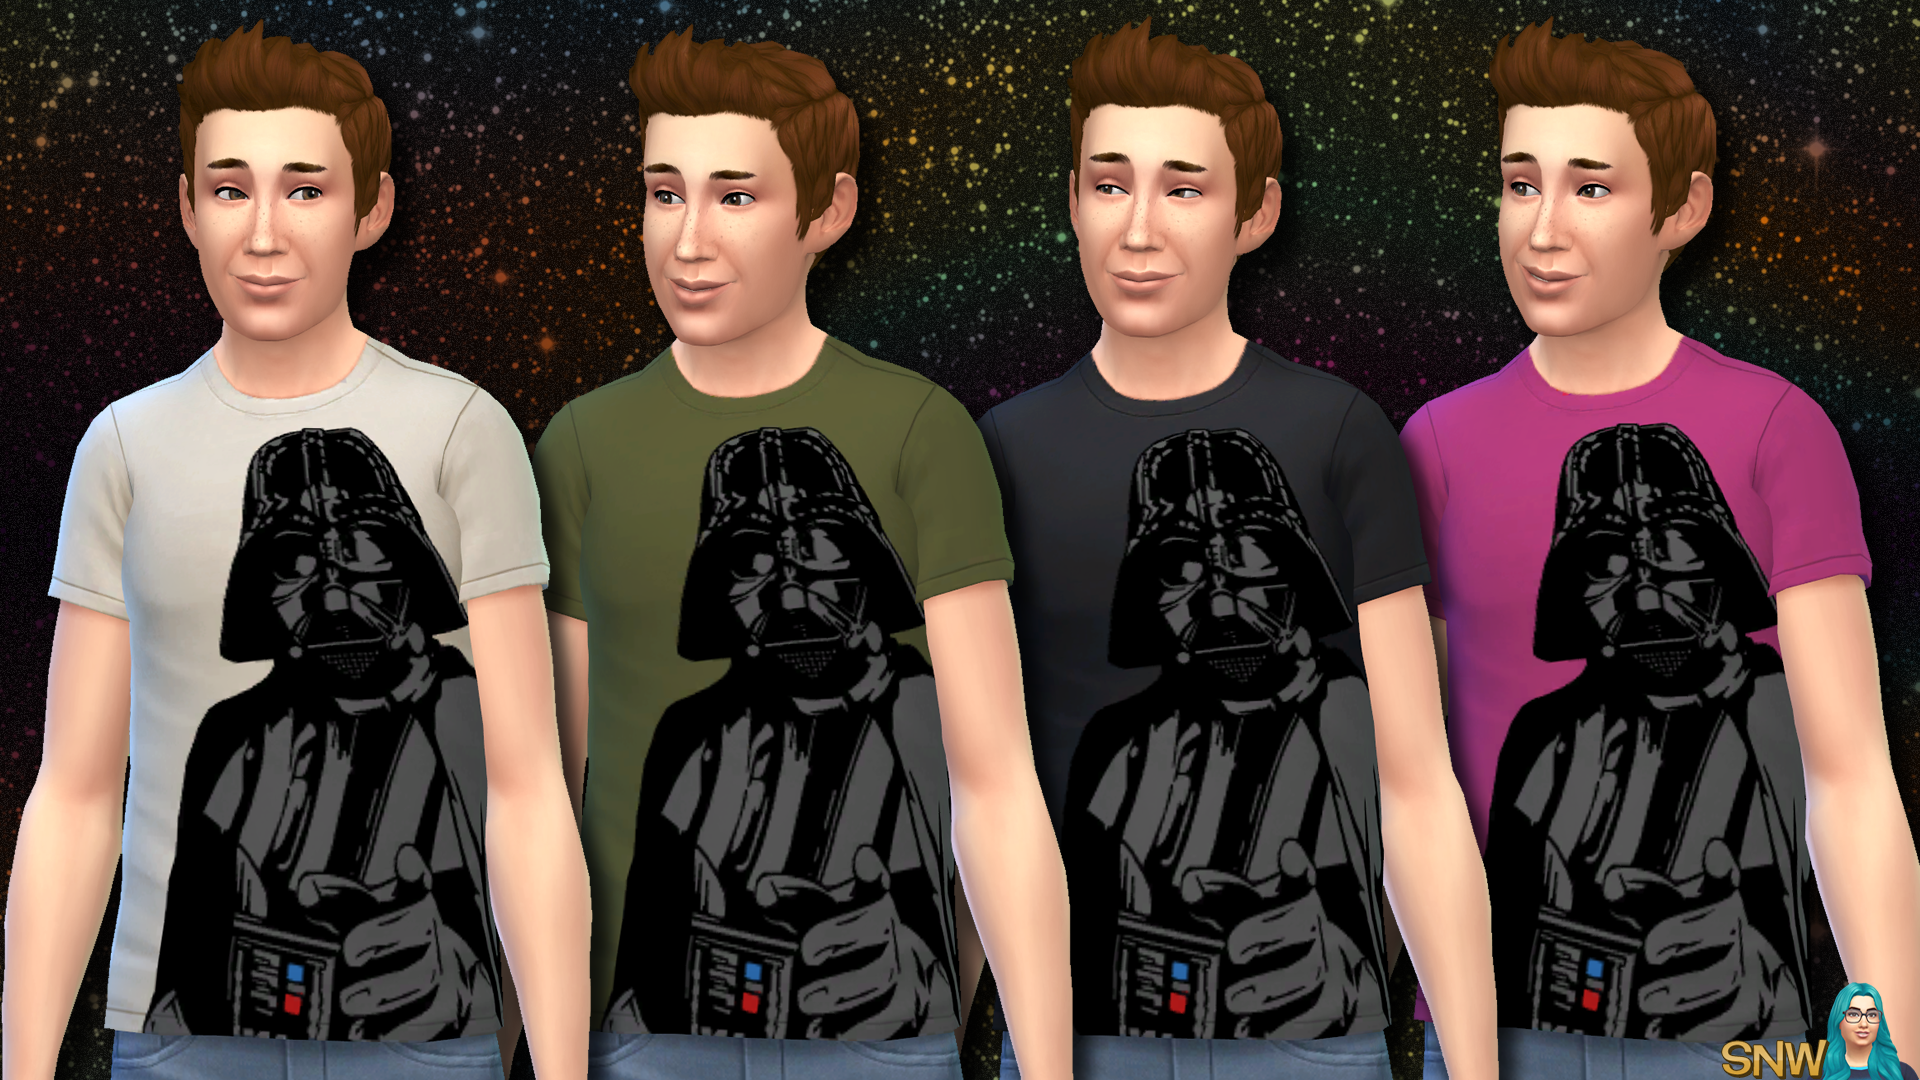 Star Wars Darth Vader Shirts for Men